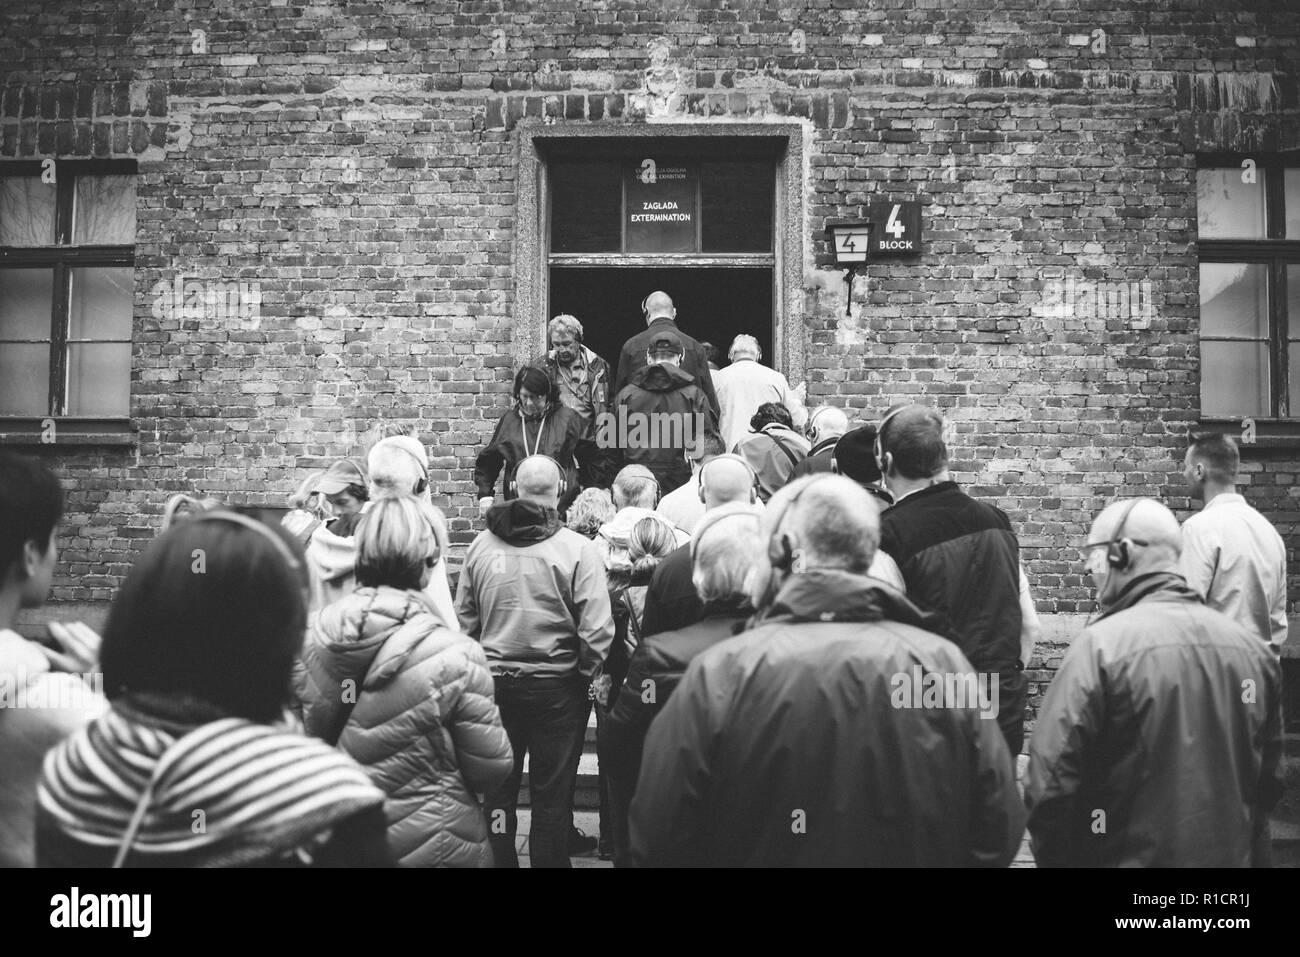 Auschwitz Nazi concentration and extermination camp. Auschwitz, German-occupied, Poland, Europe - Stock Image